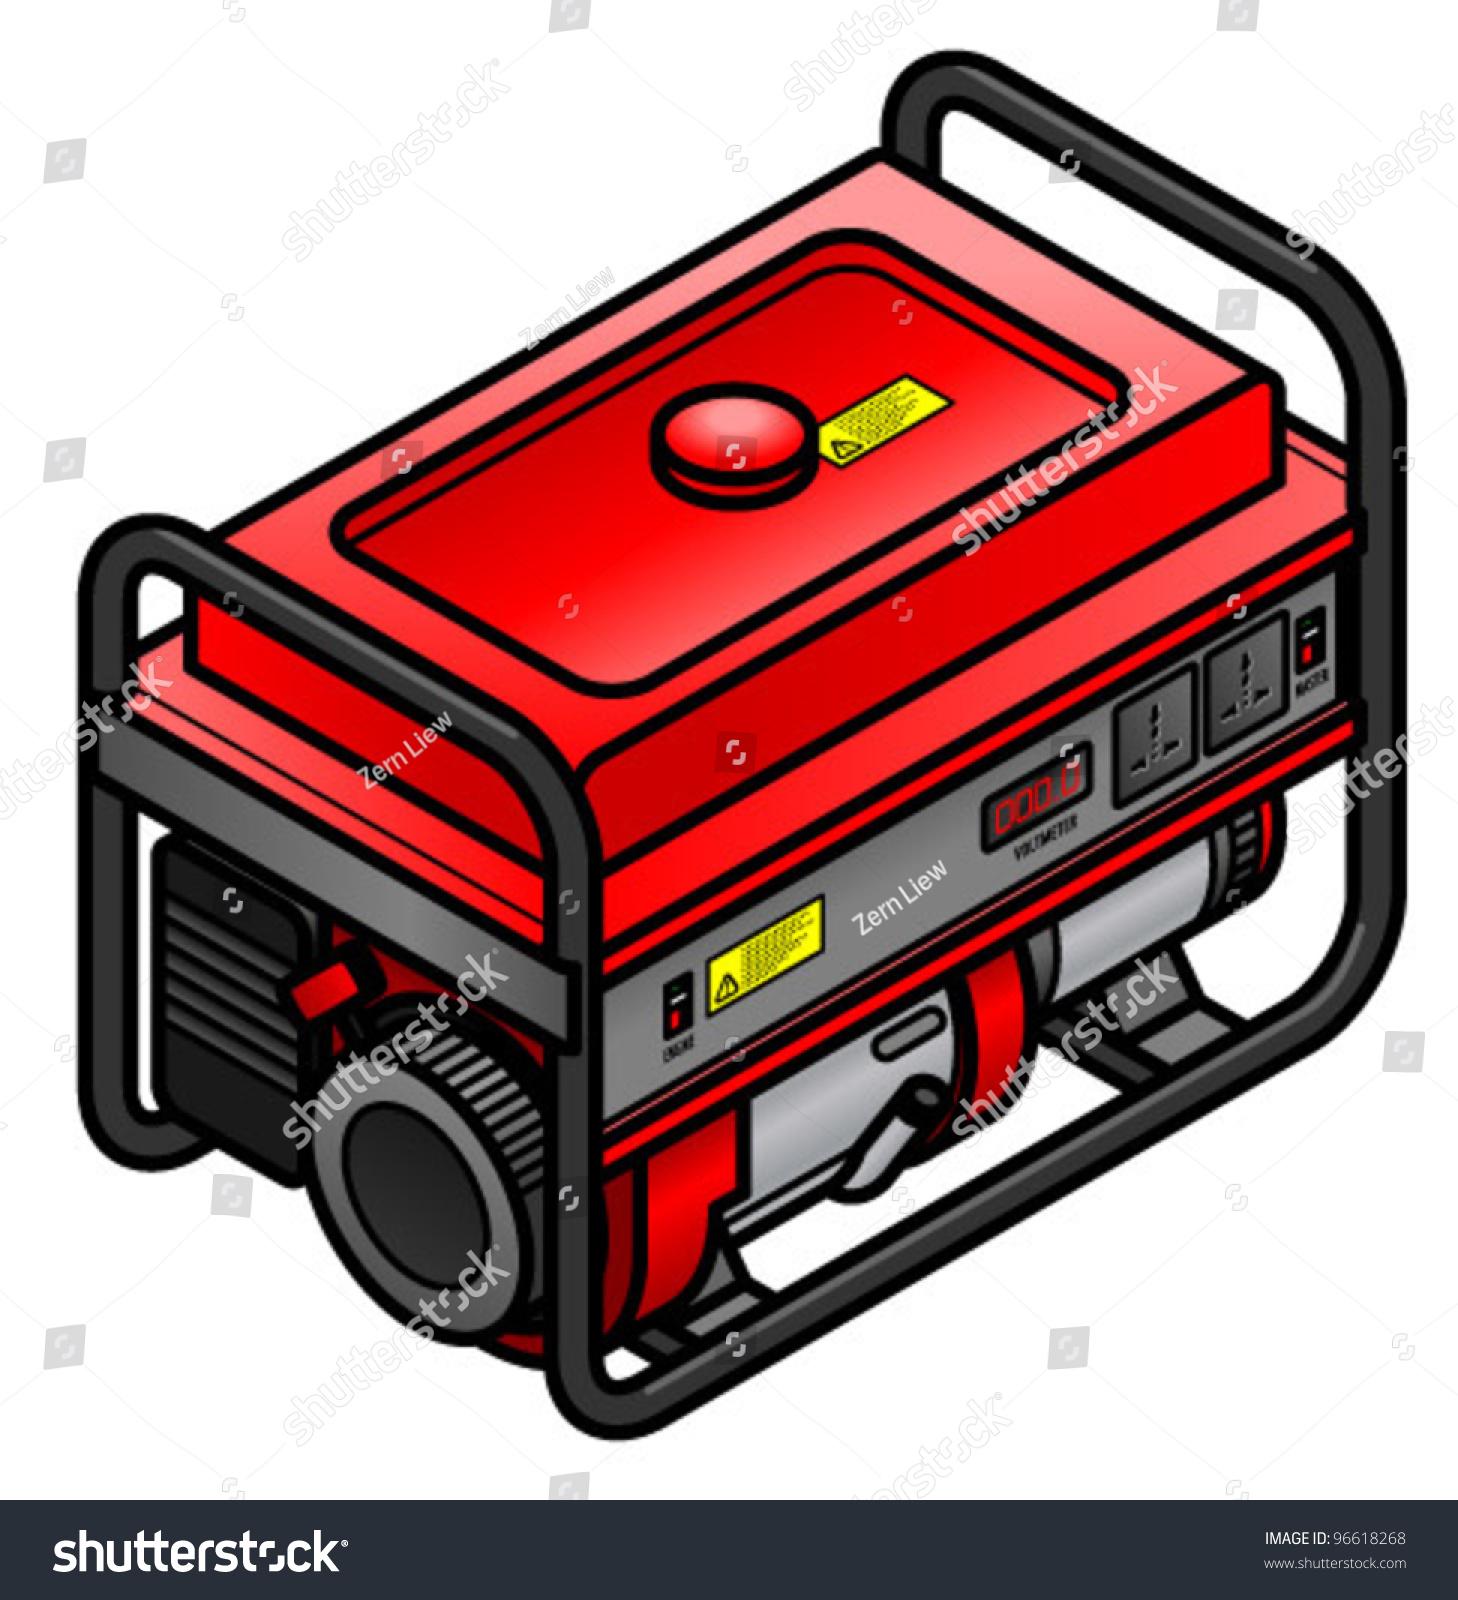 Portable Petrolgasoline Generator International Power